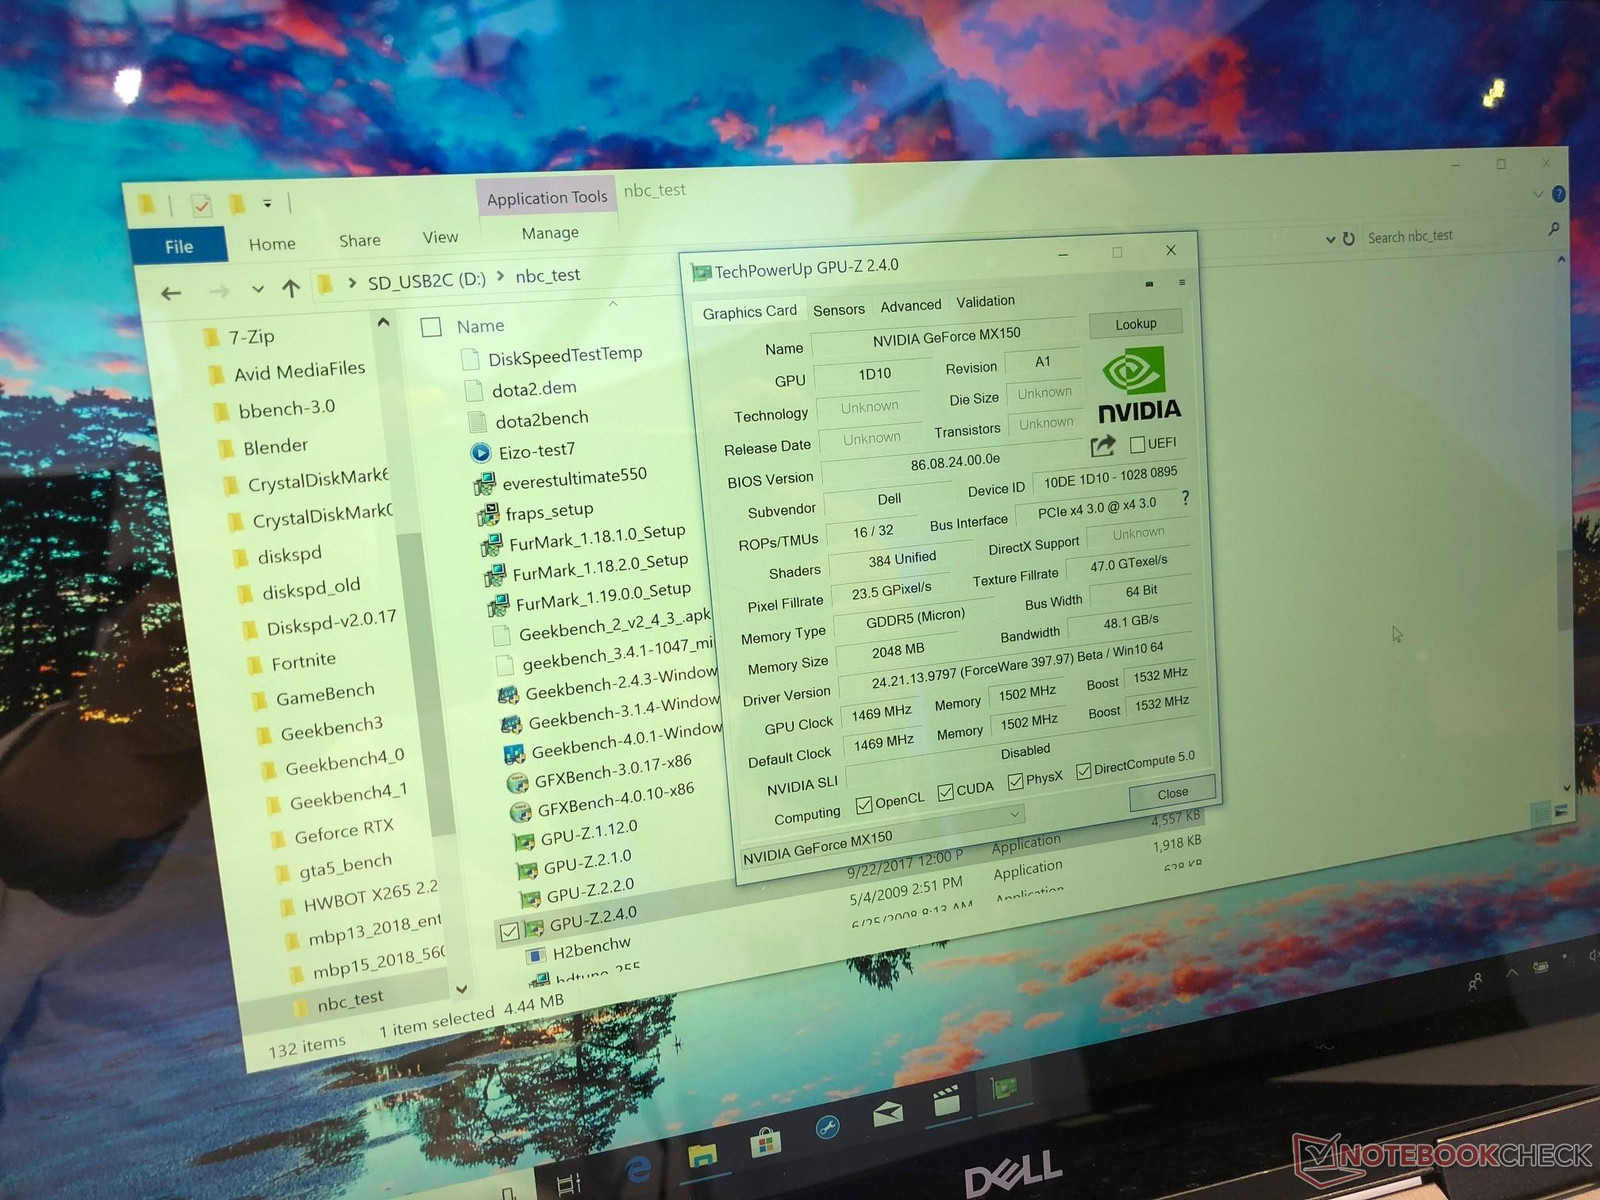 nvidia geforce mx150 driver download